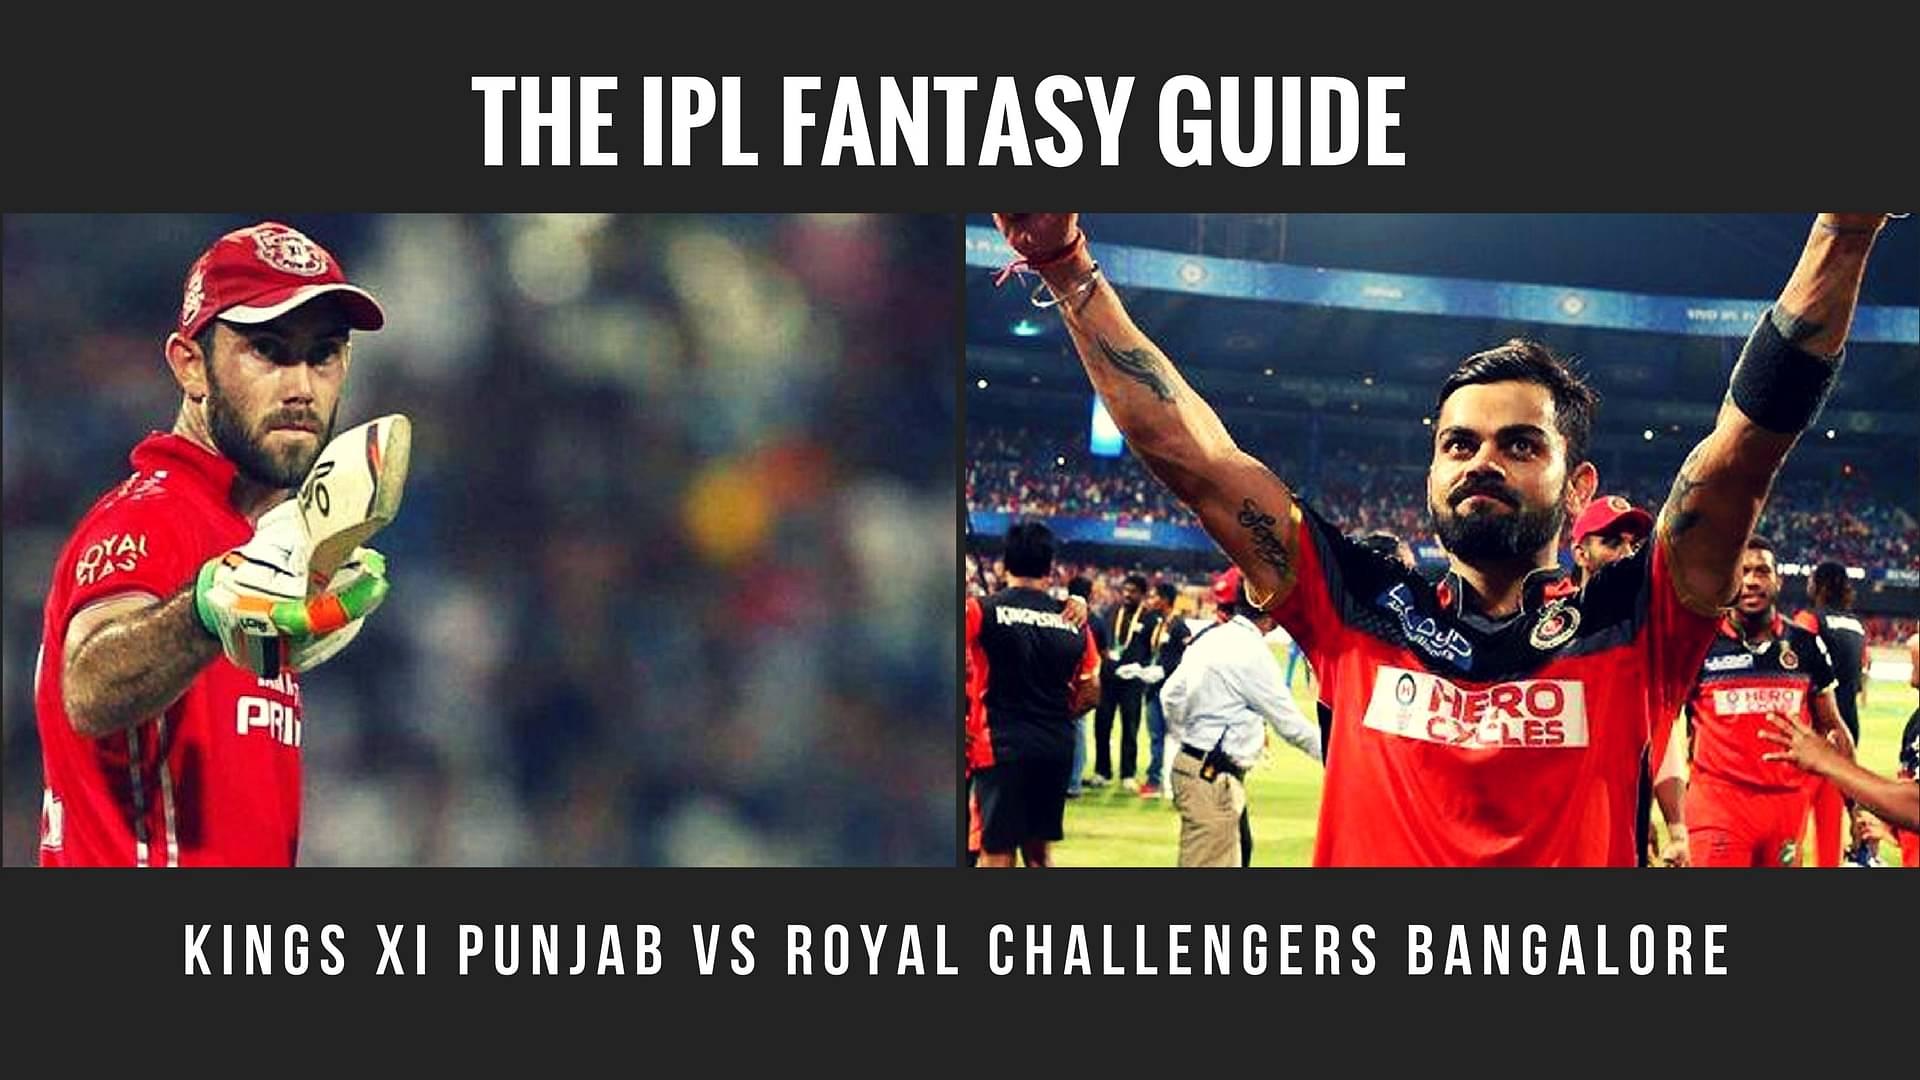 Fantasy Tips for Kings XI Punjab vs Royal Challengers Bangalore